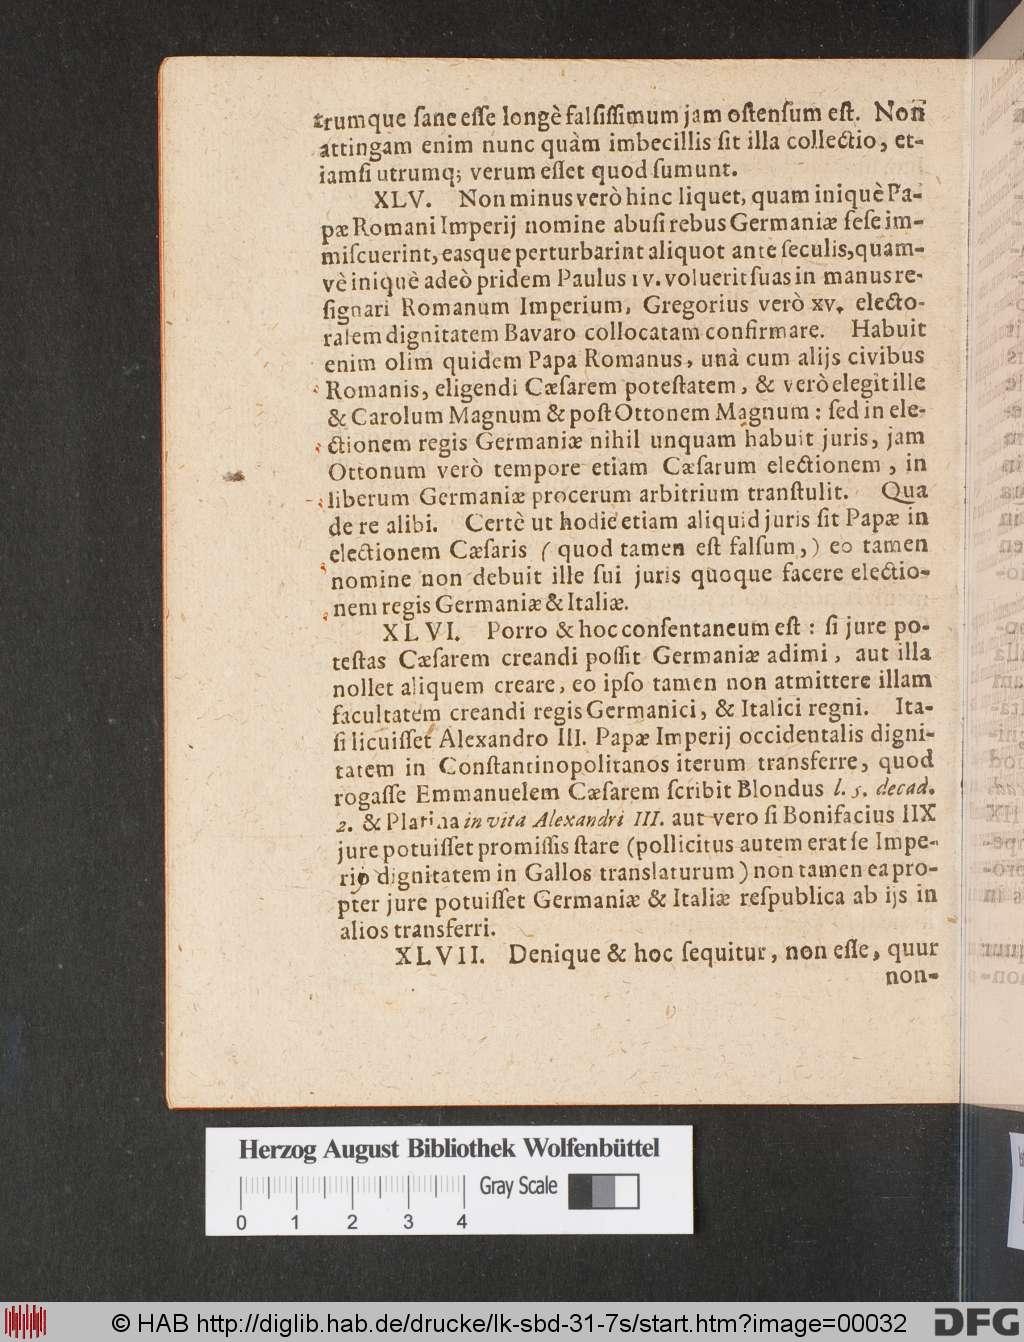 http://diglib.hab.de/drucke/lk-sbd-31-7s/00032.jpg